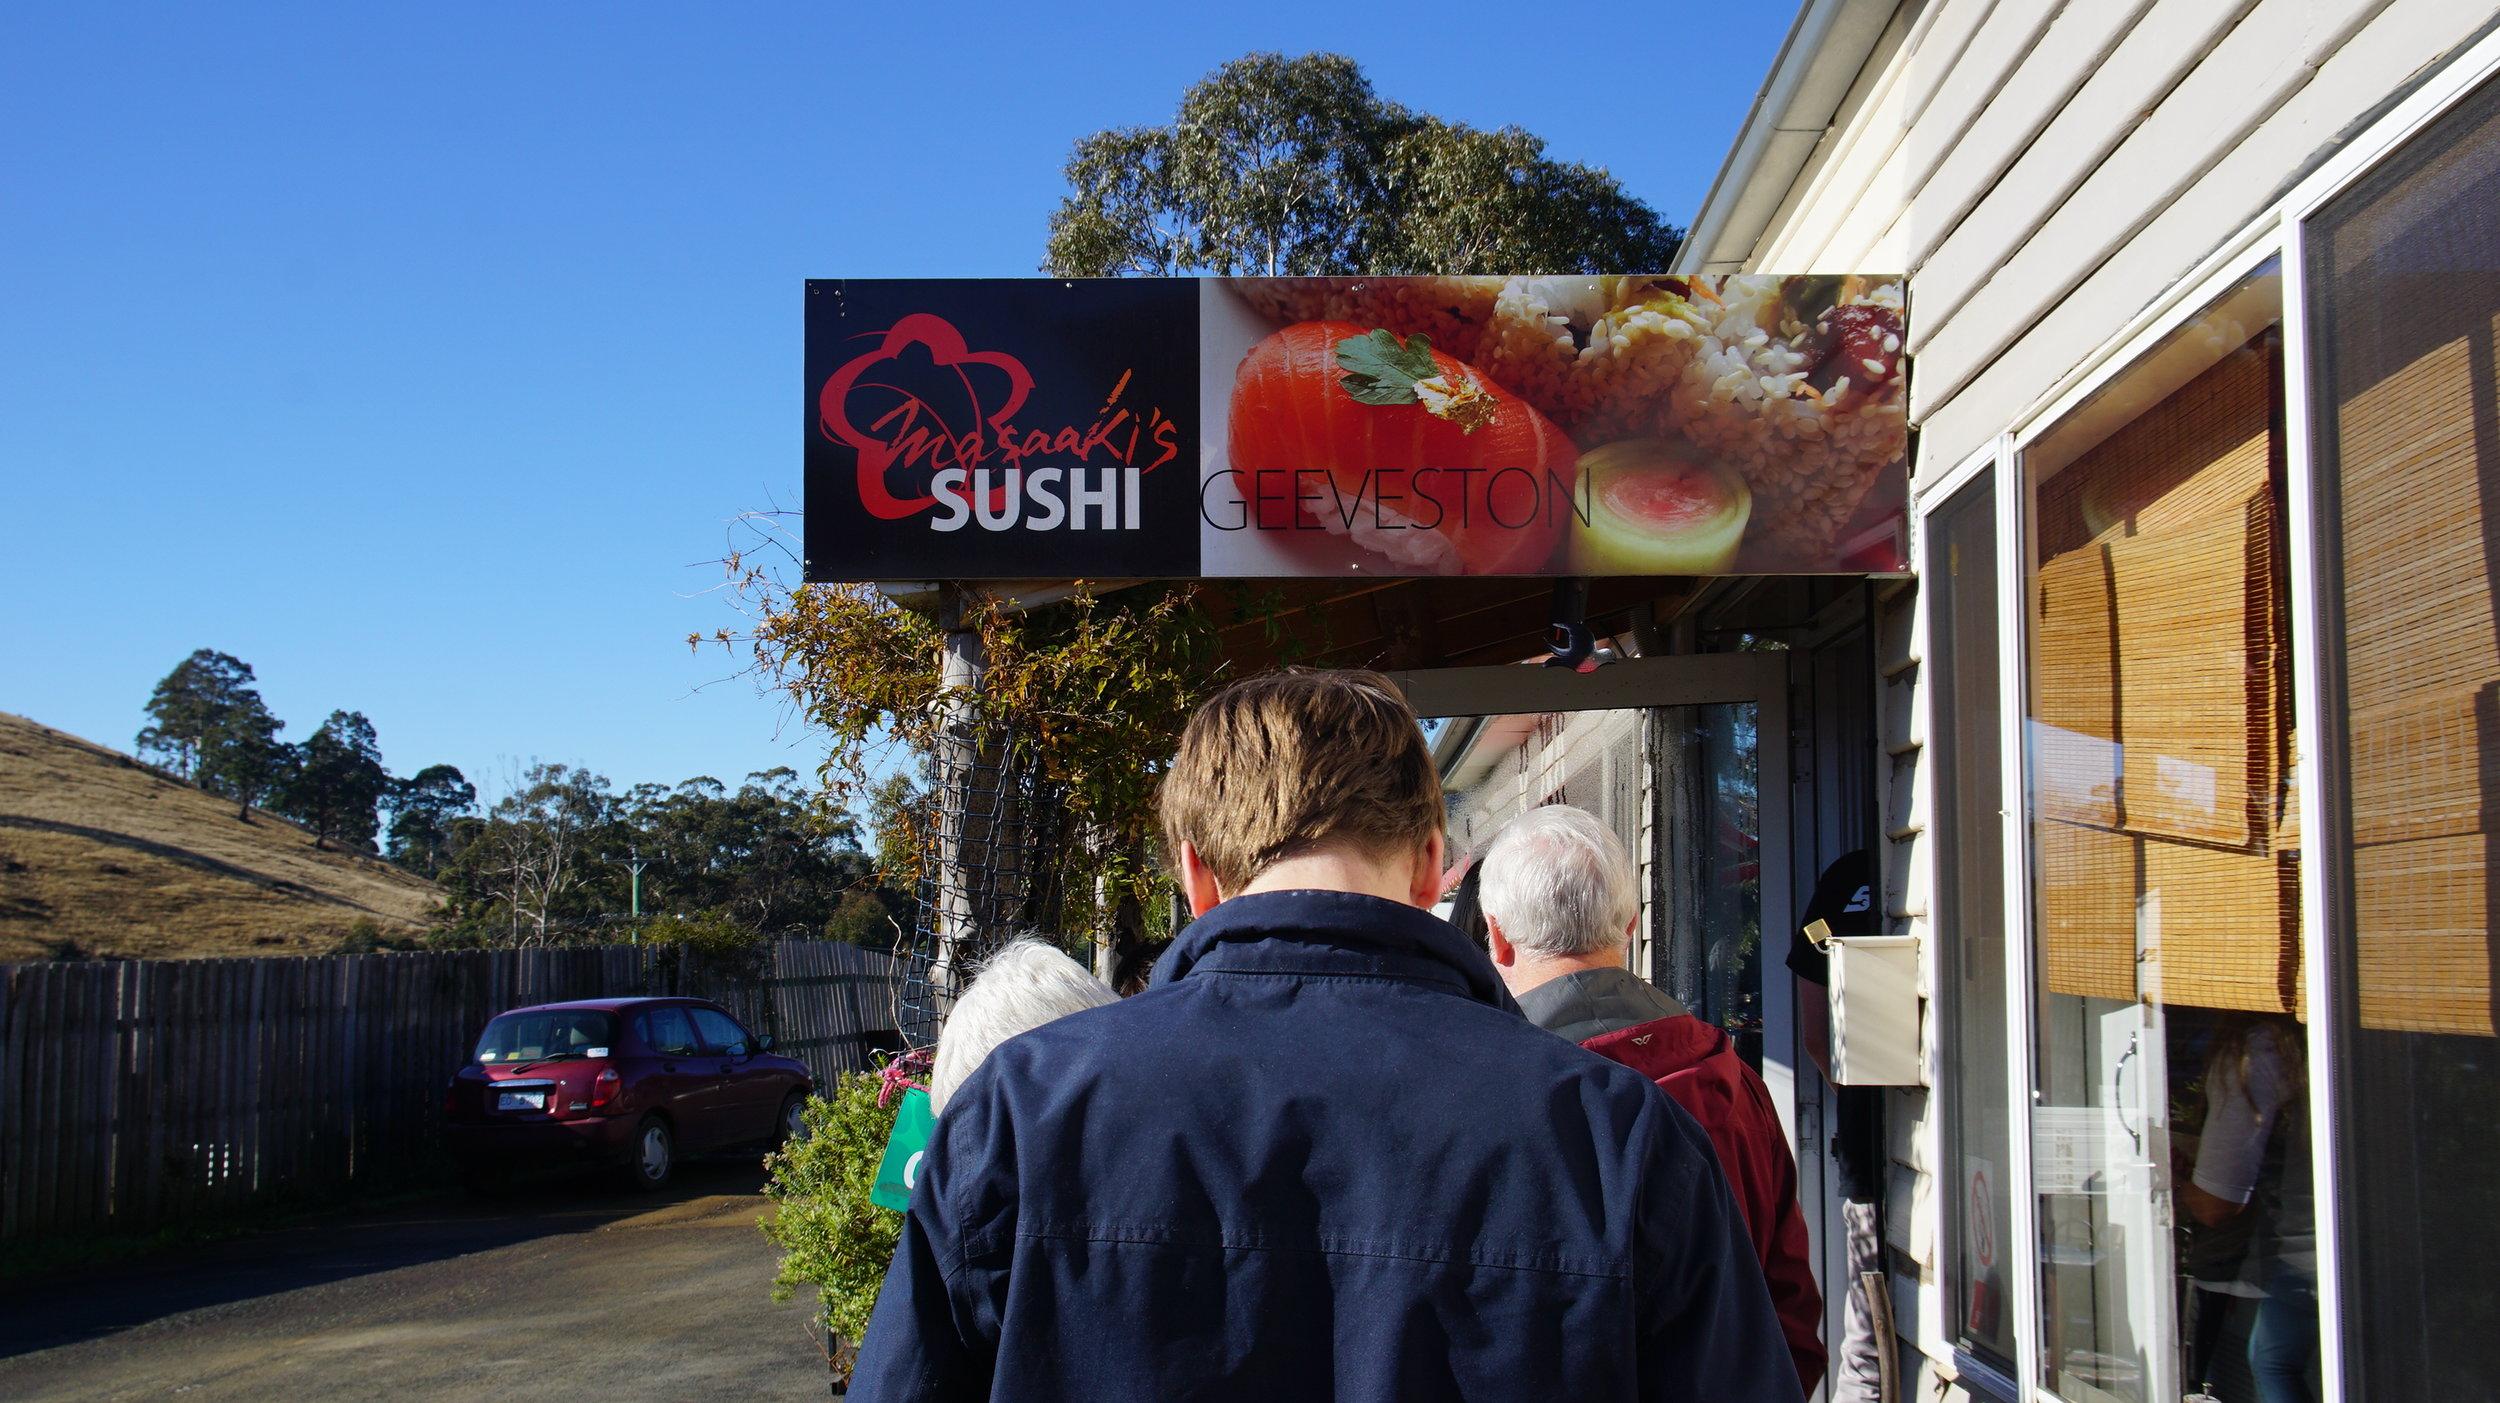 Queue at Masaaki's Sushi